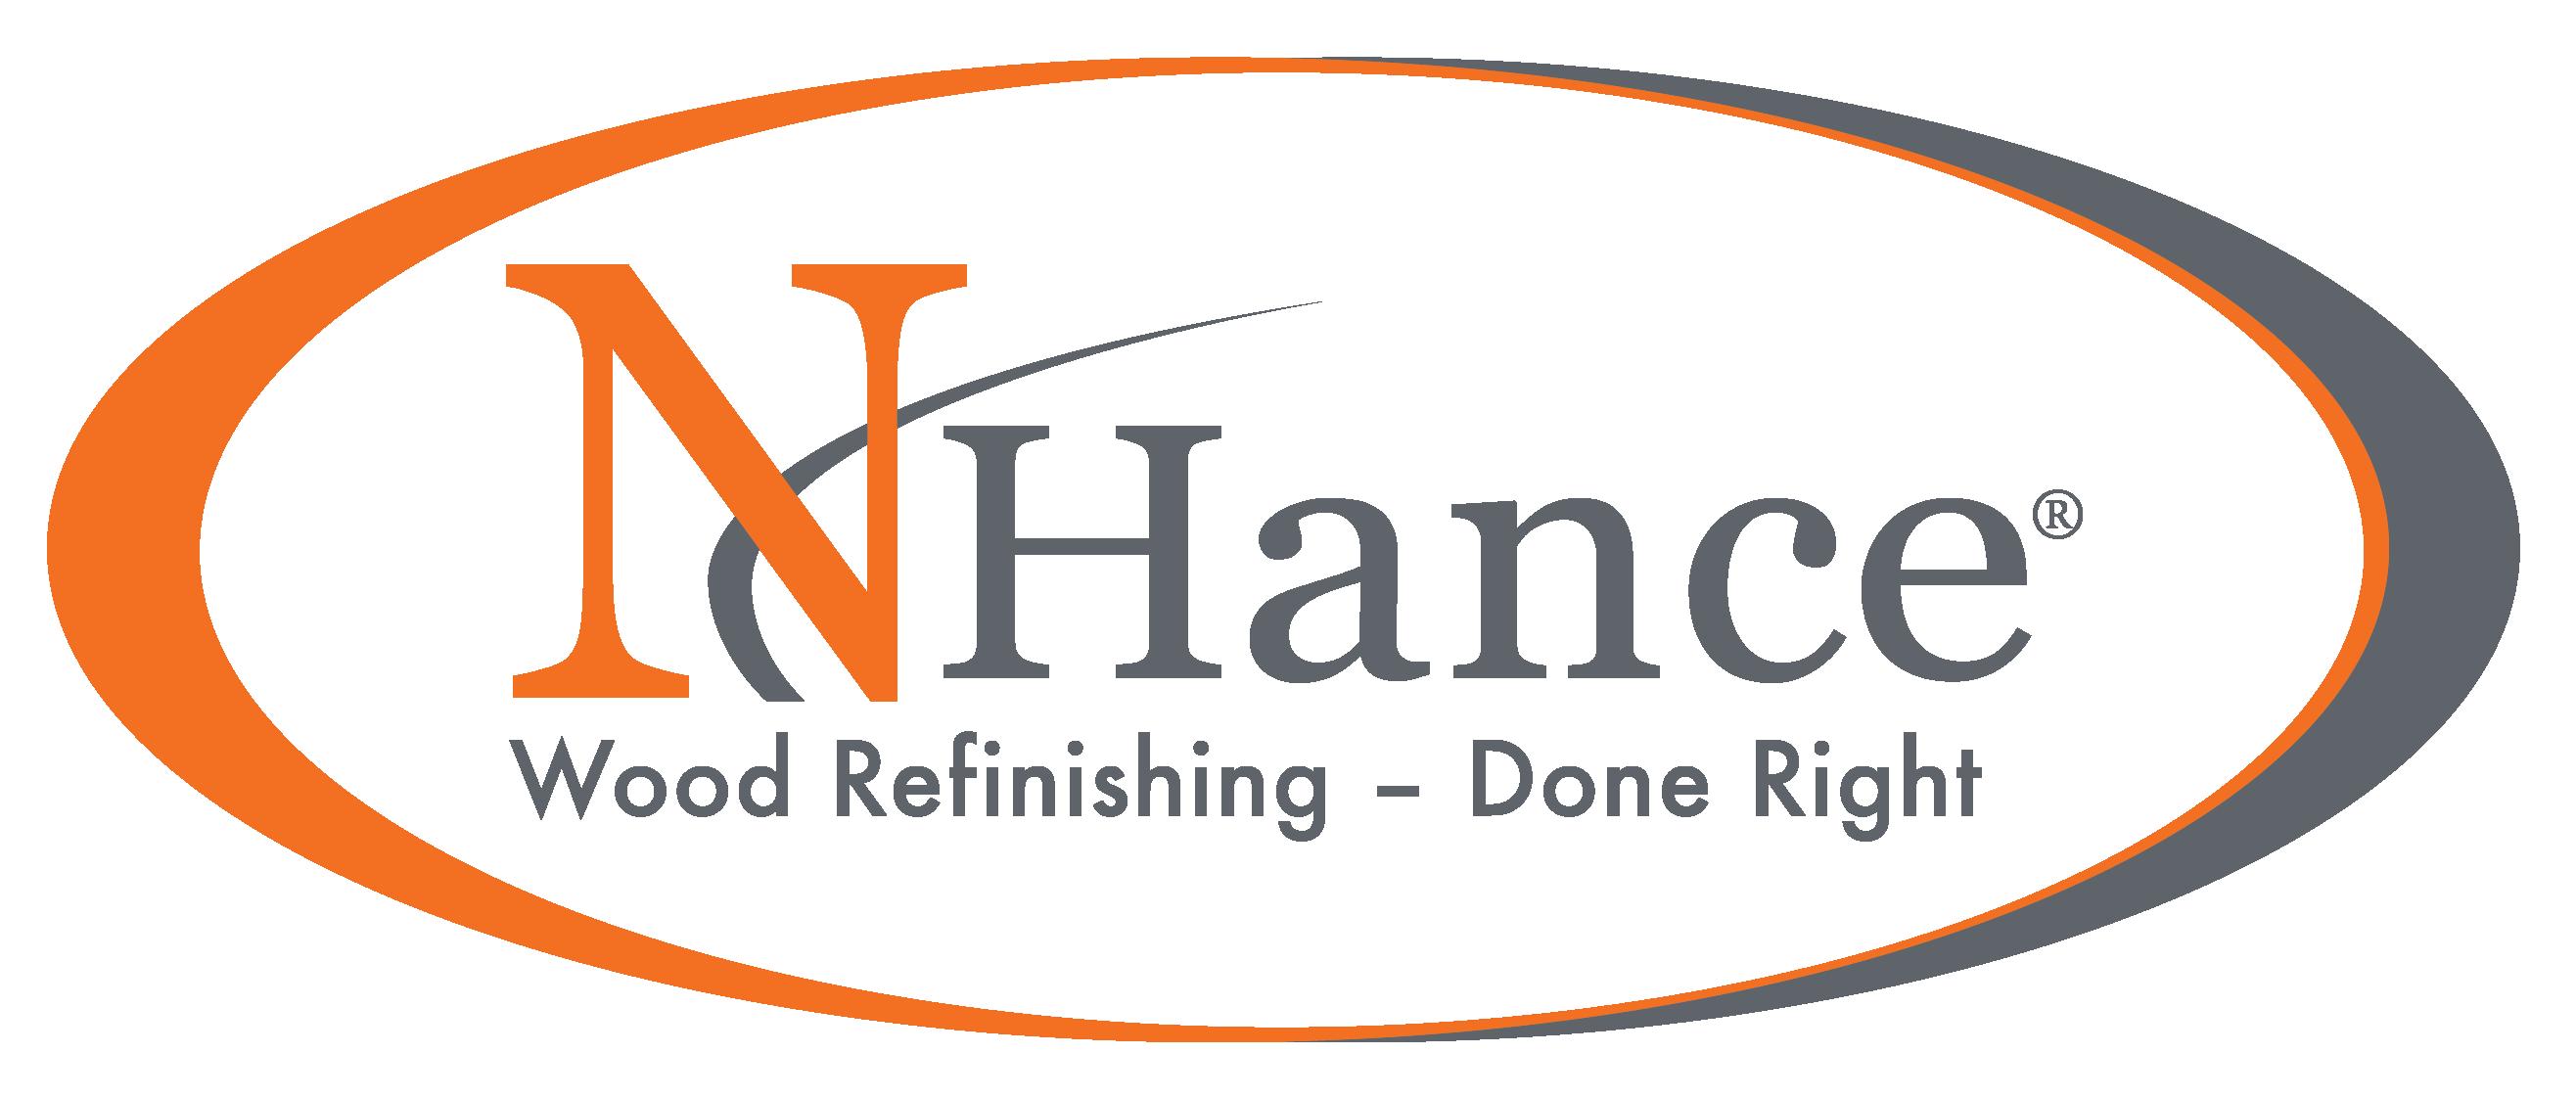 N-Hance Franchises logo Kite Media project